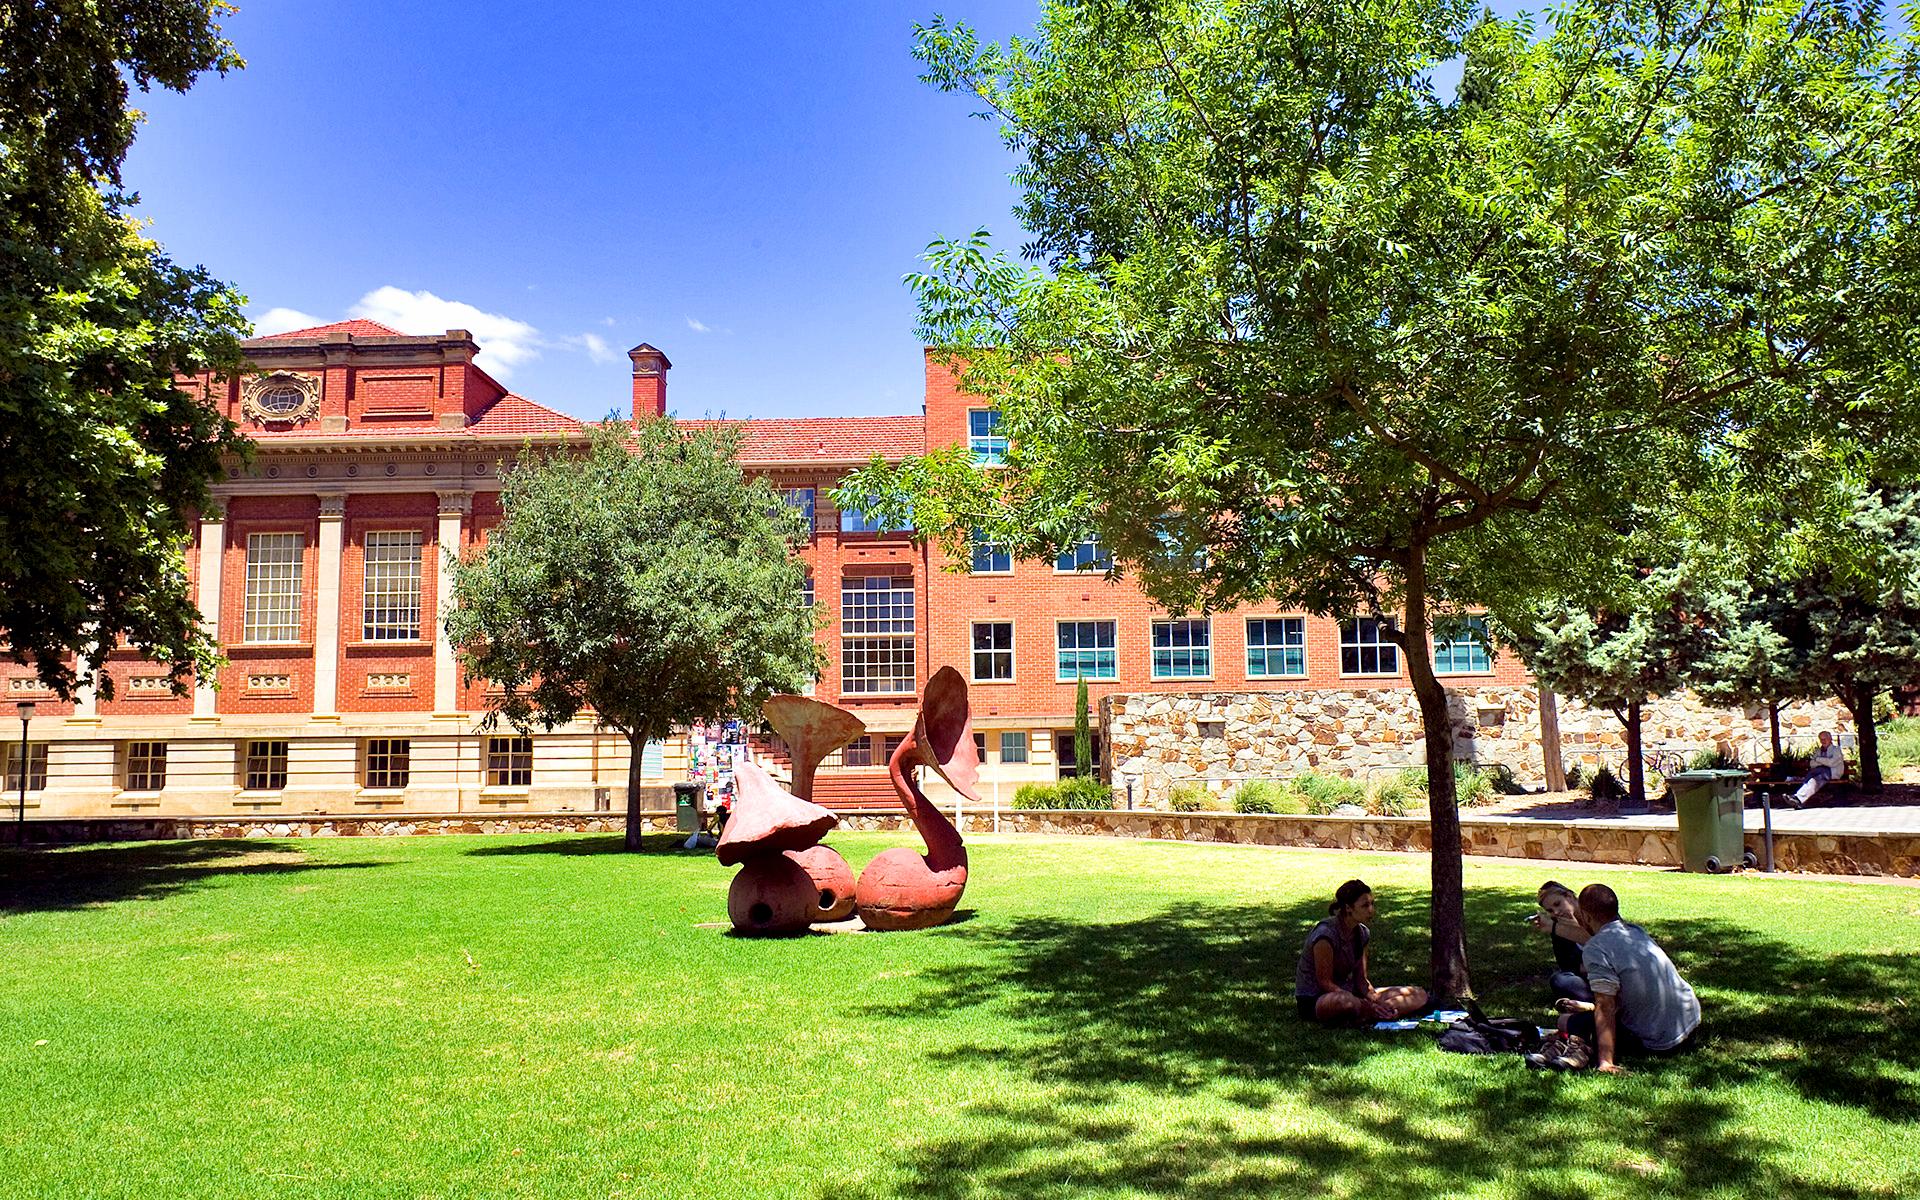 The University of Adelaide2